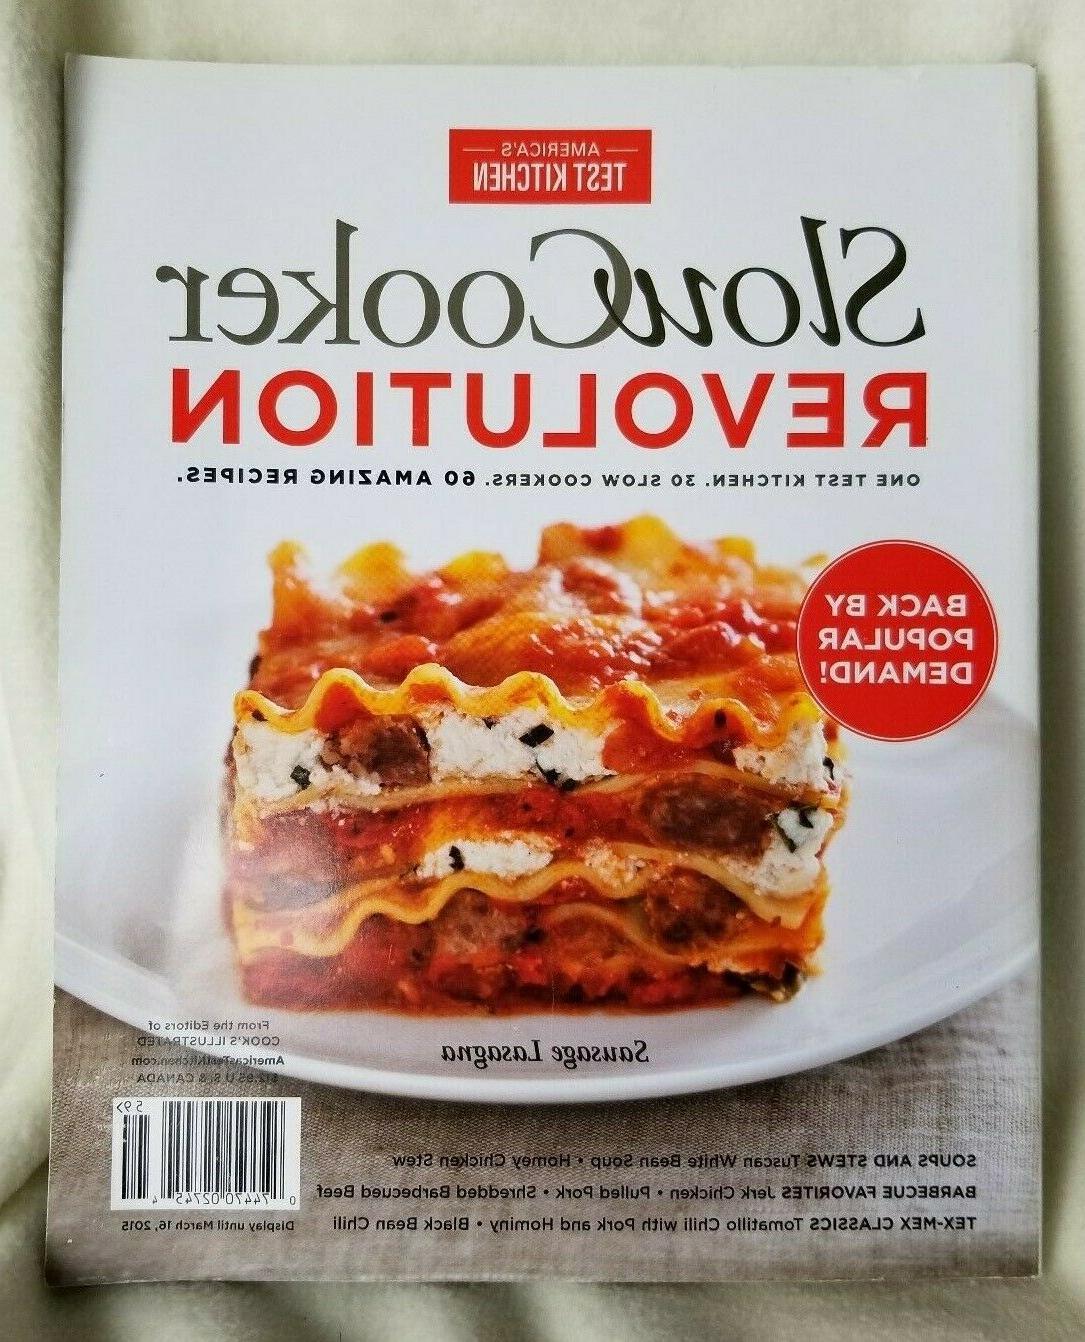 slow cooker revolution cookbook america s test